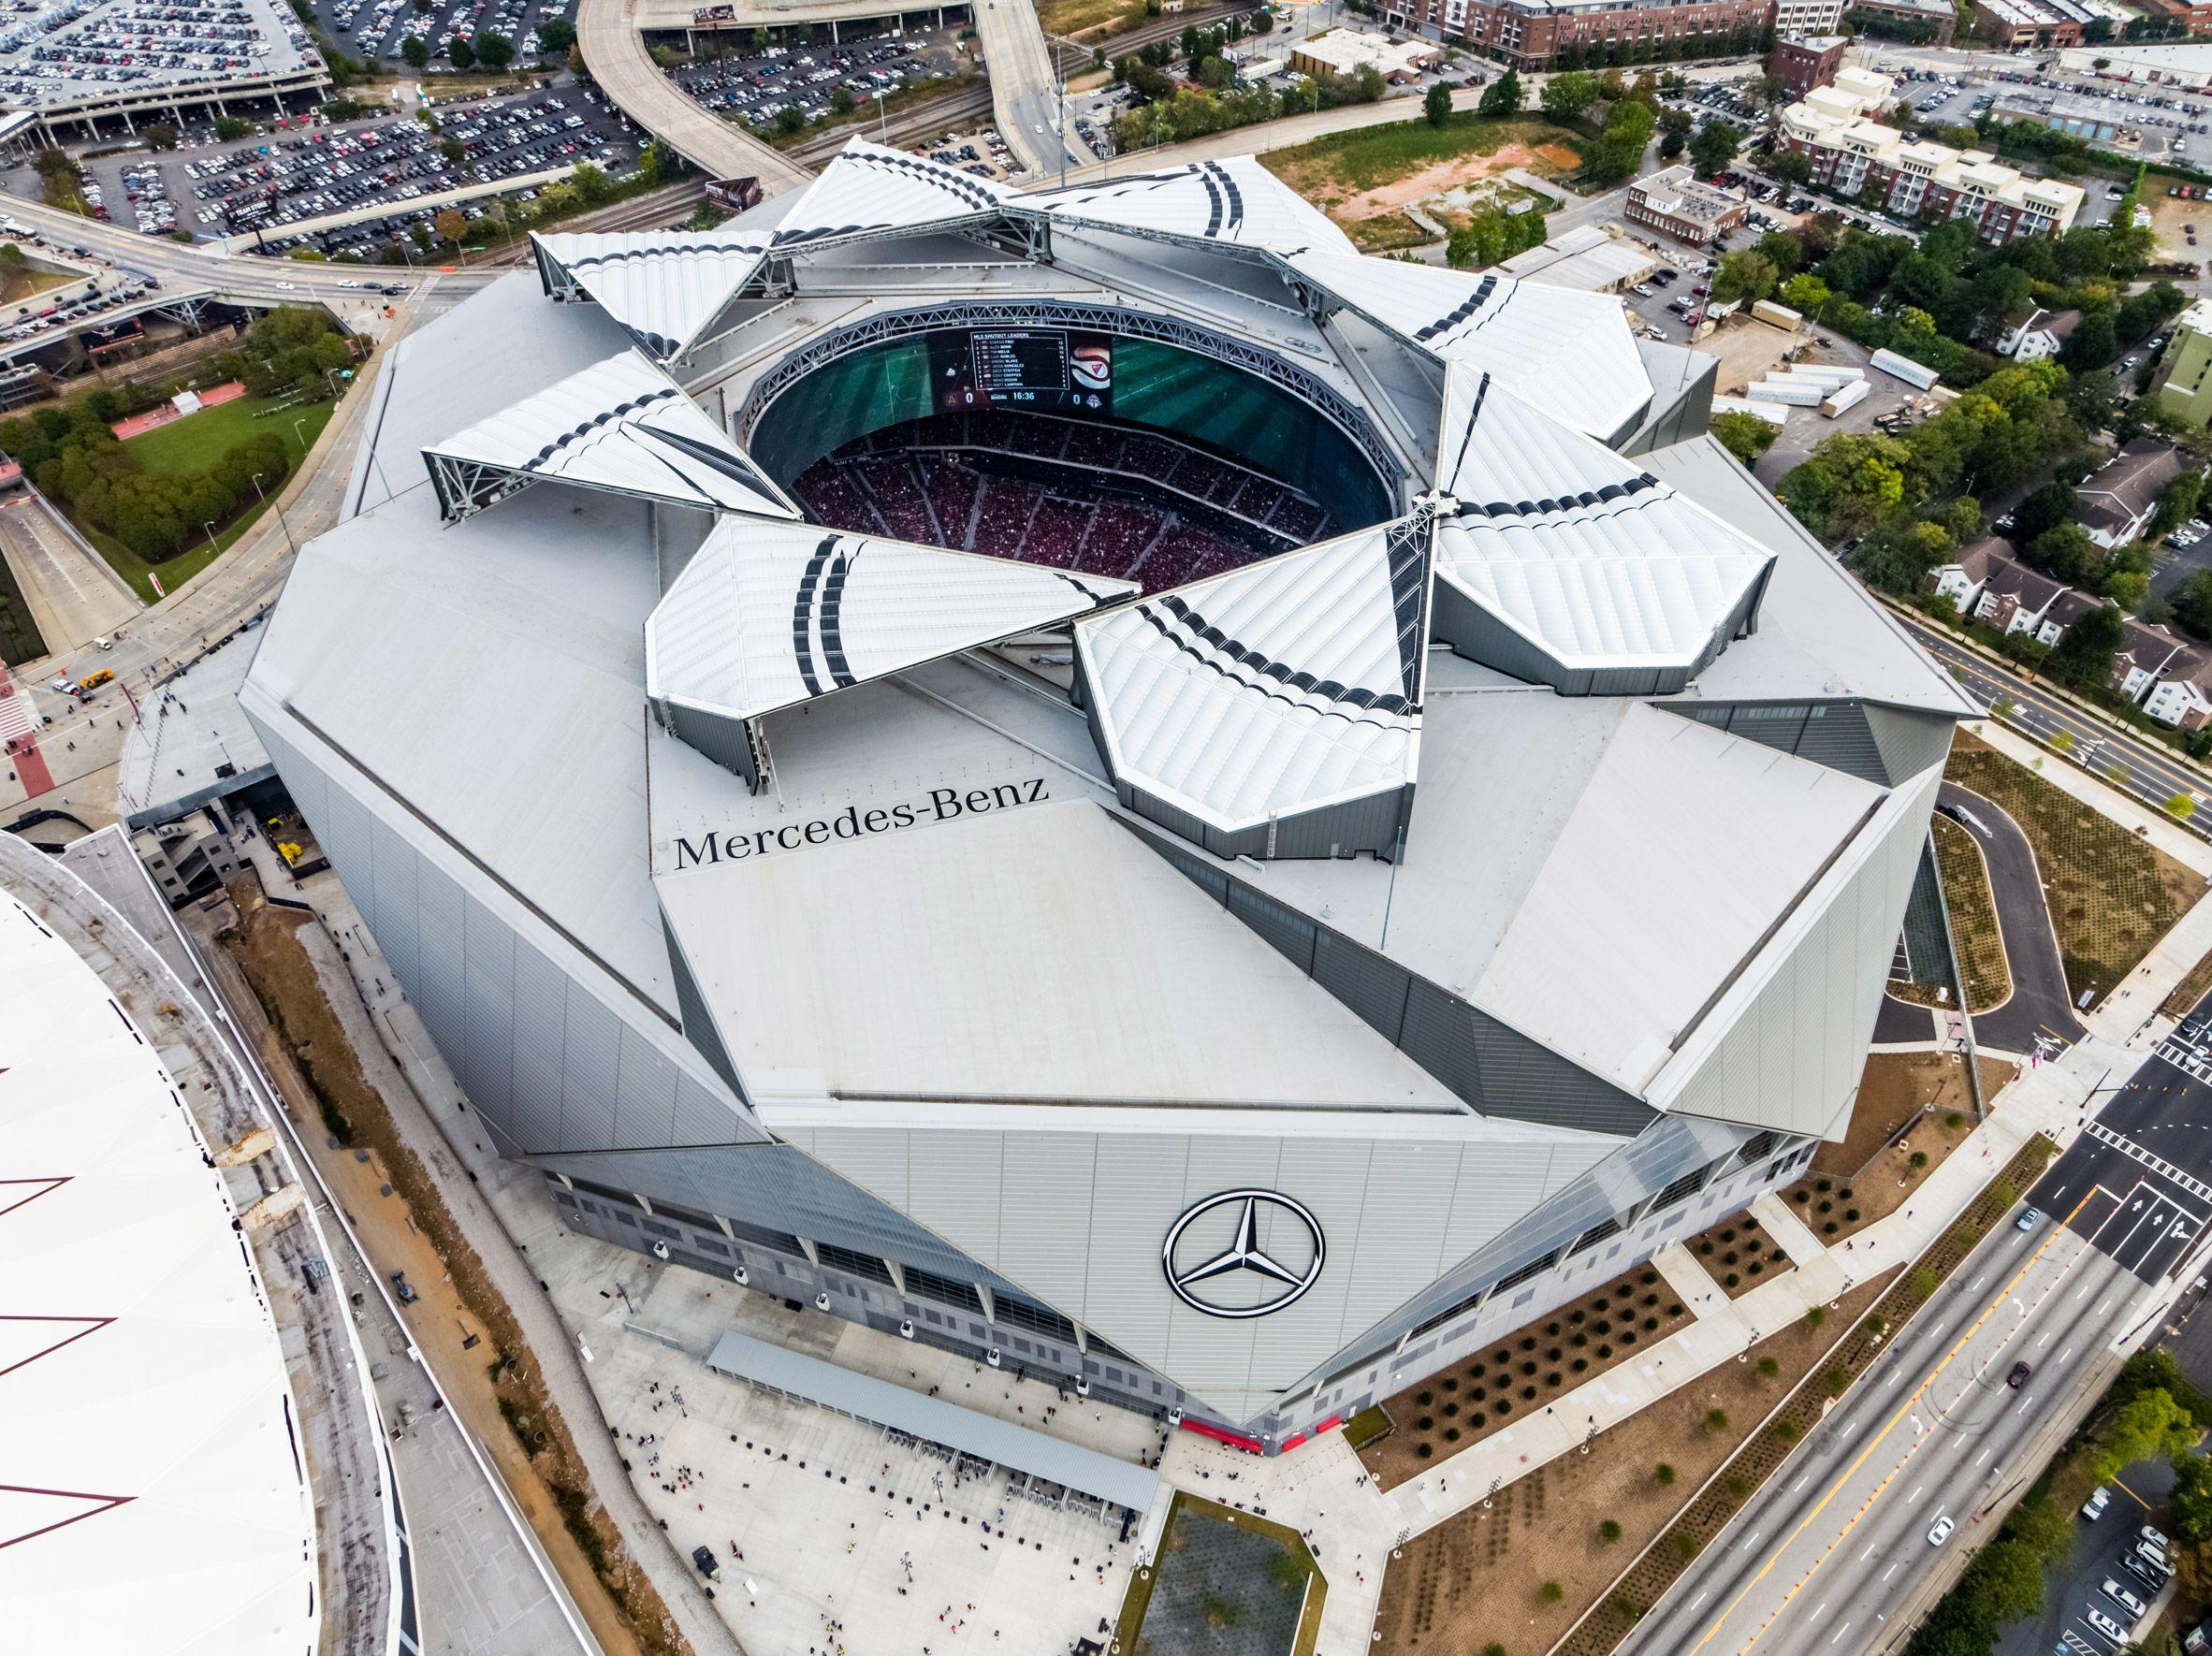 Atlanta Stadium By Hok Hosts Nfl Games Under Retractable Petals Stadium Architecture Football Stadiums Nfl Stadiums